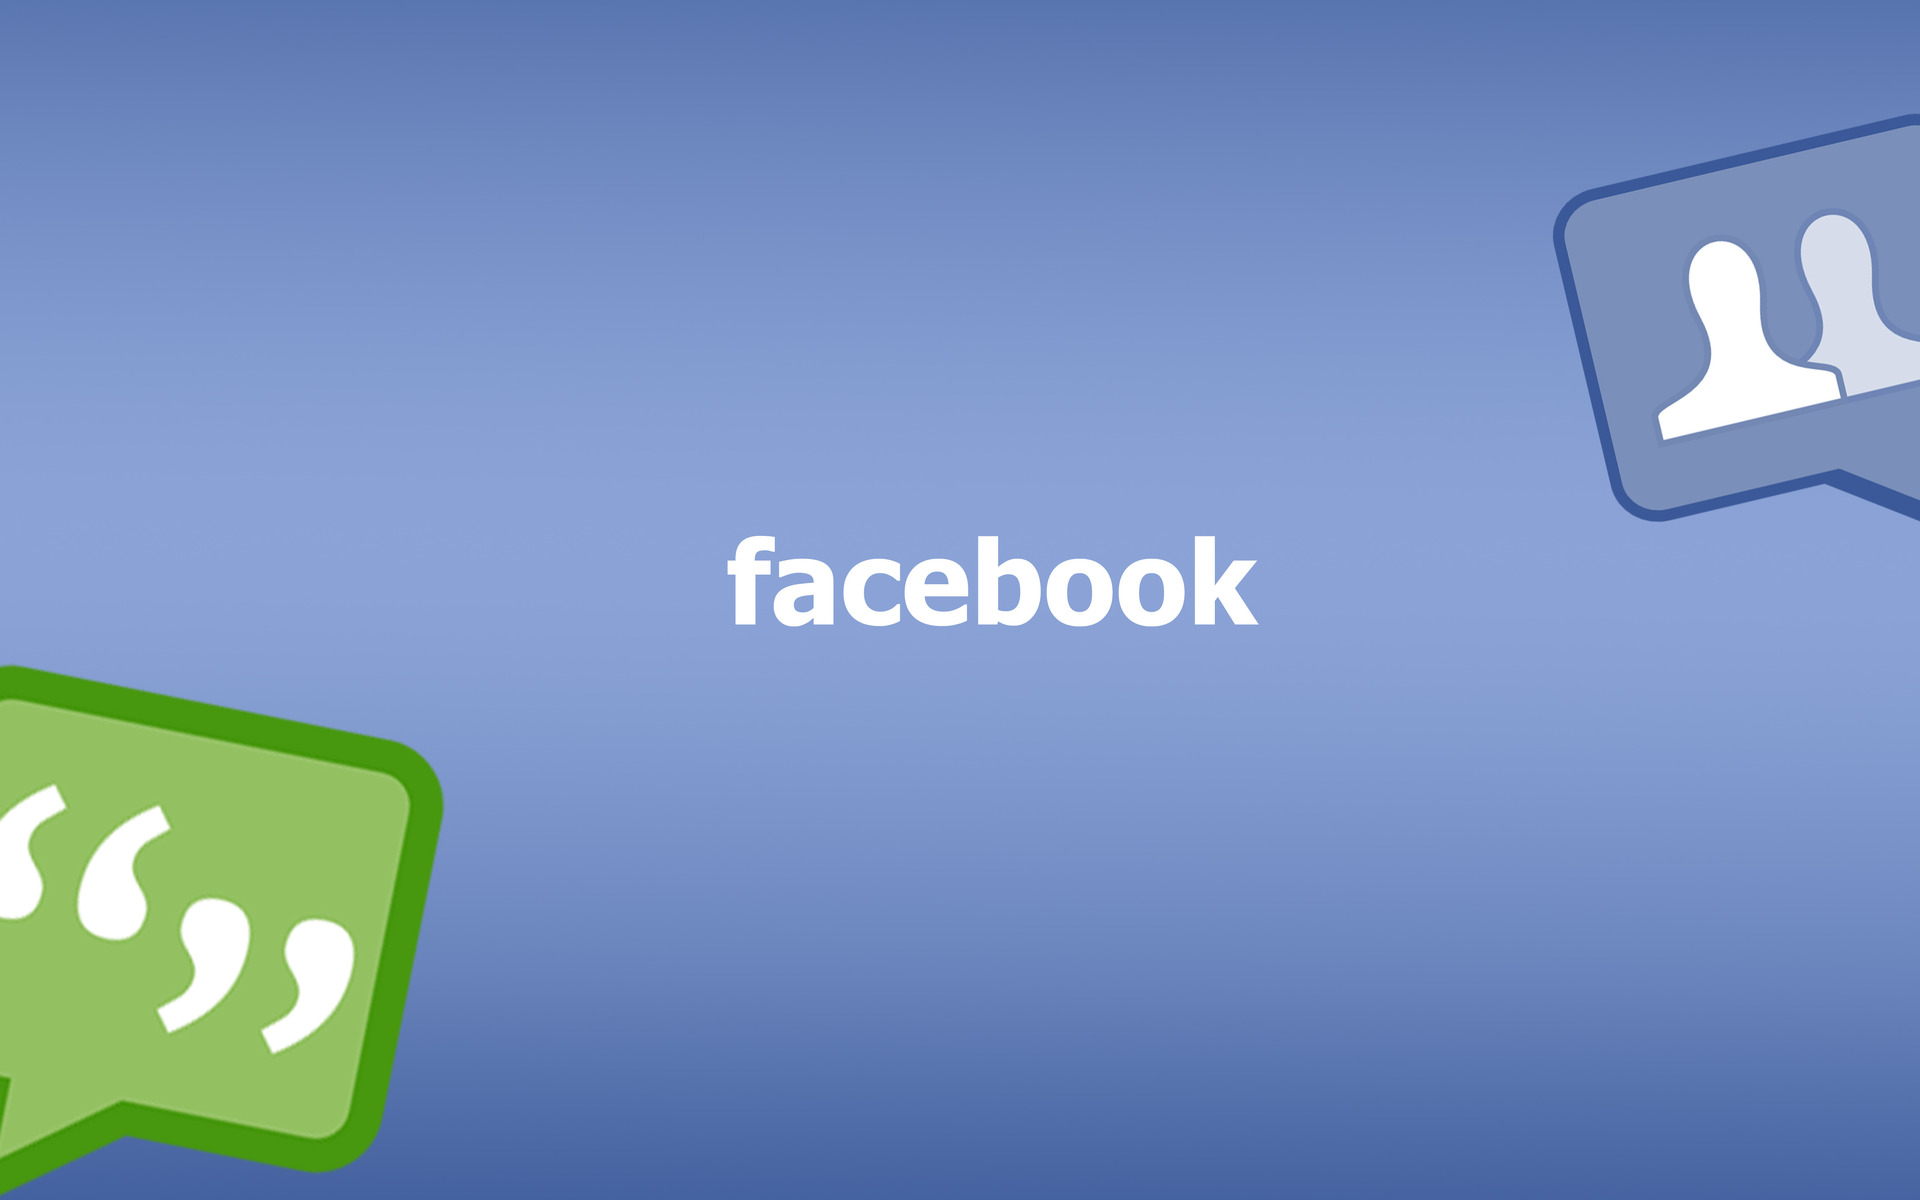 Facebook HD Wallpaper | Hd Wallpapers